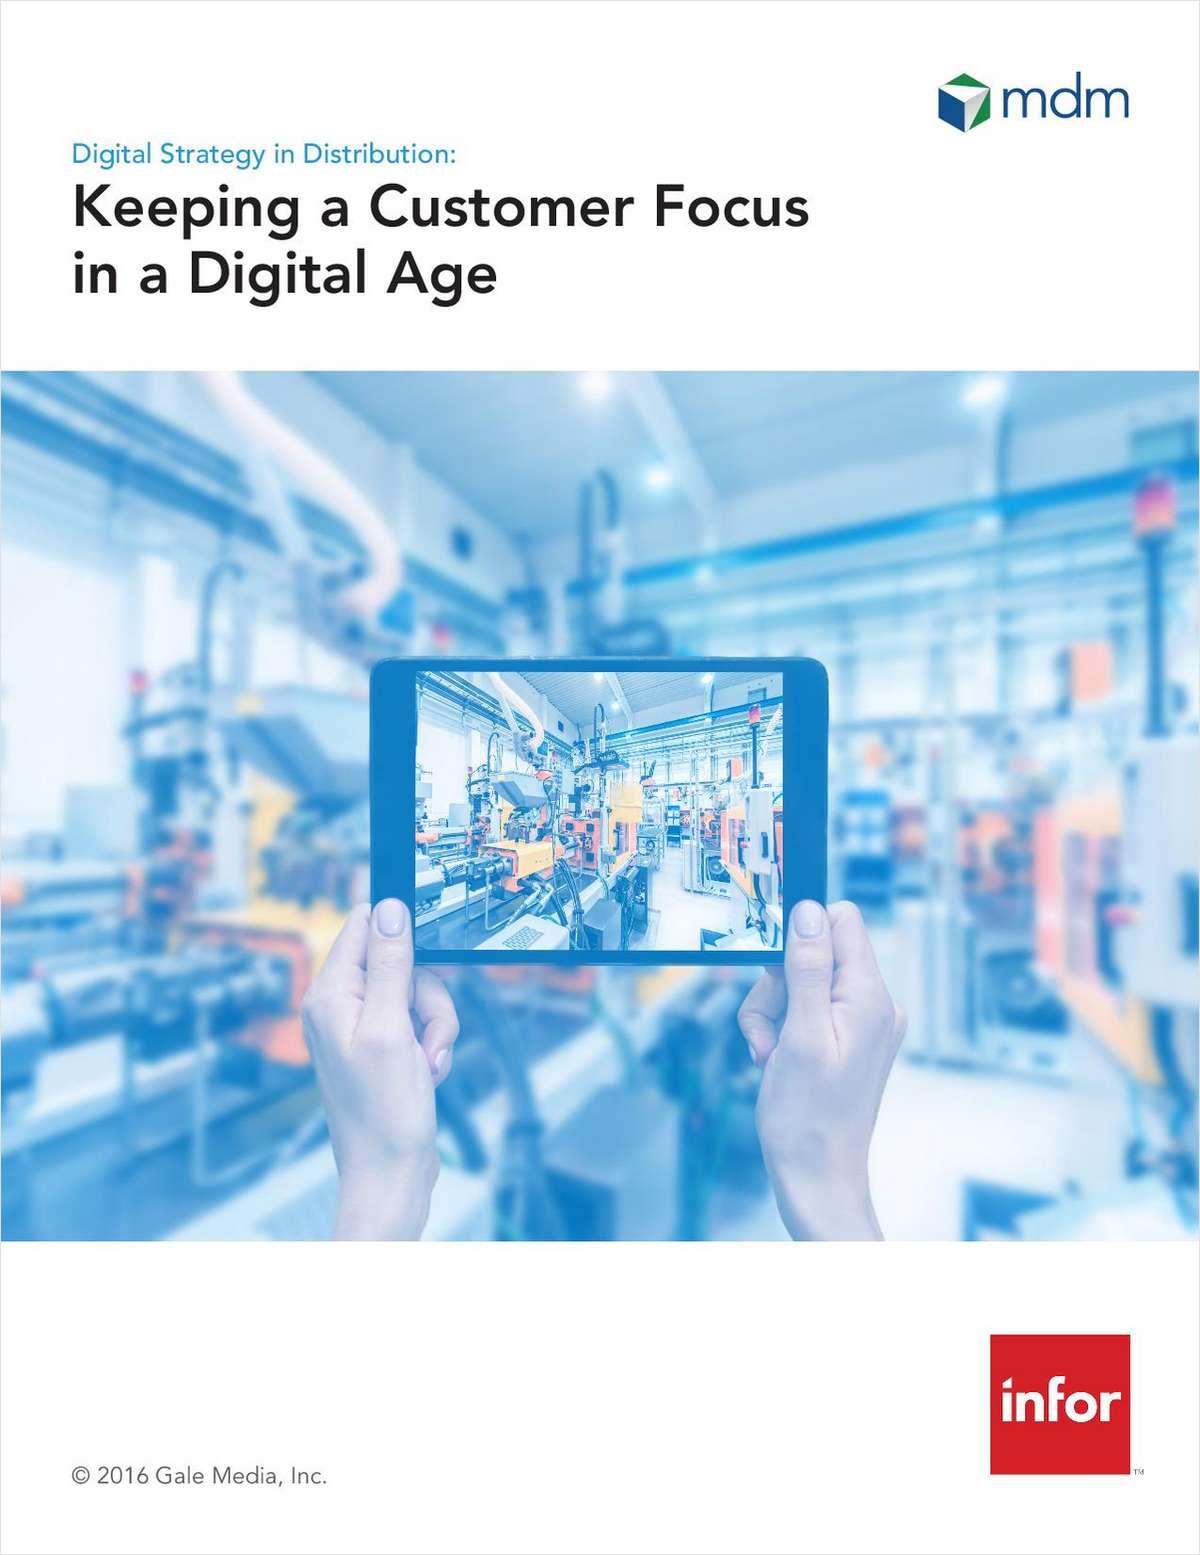 MDM Whitepaper: Keeping a Customer Focus in a Digital Age